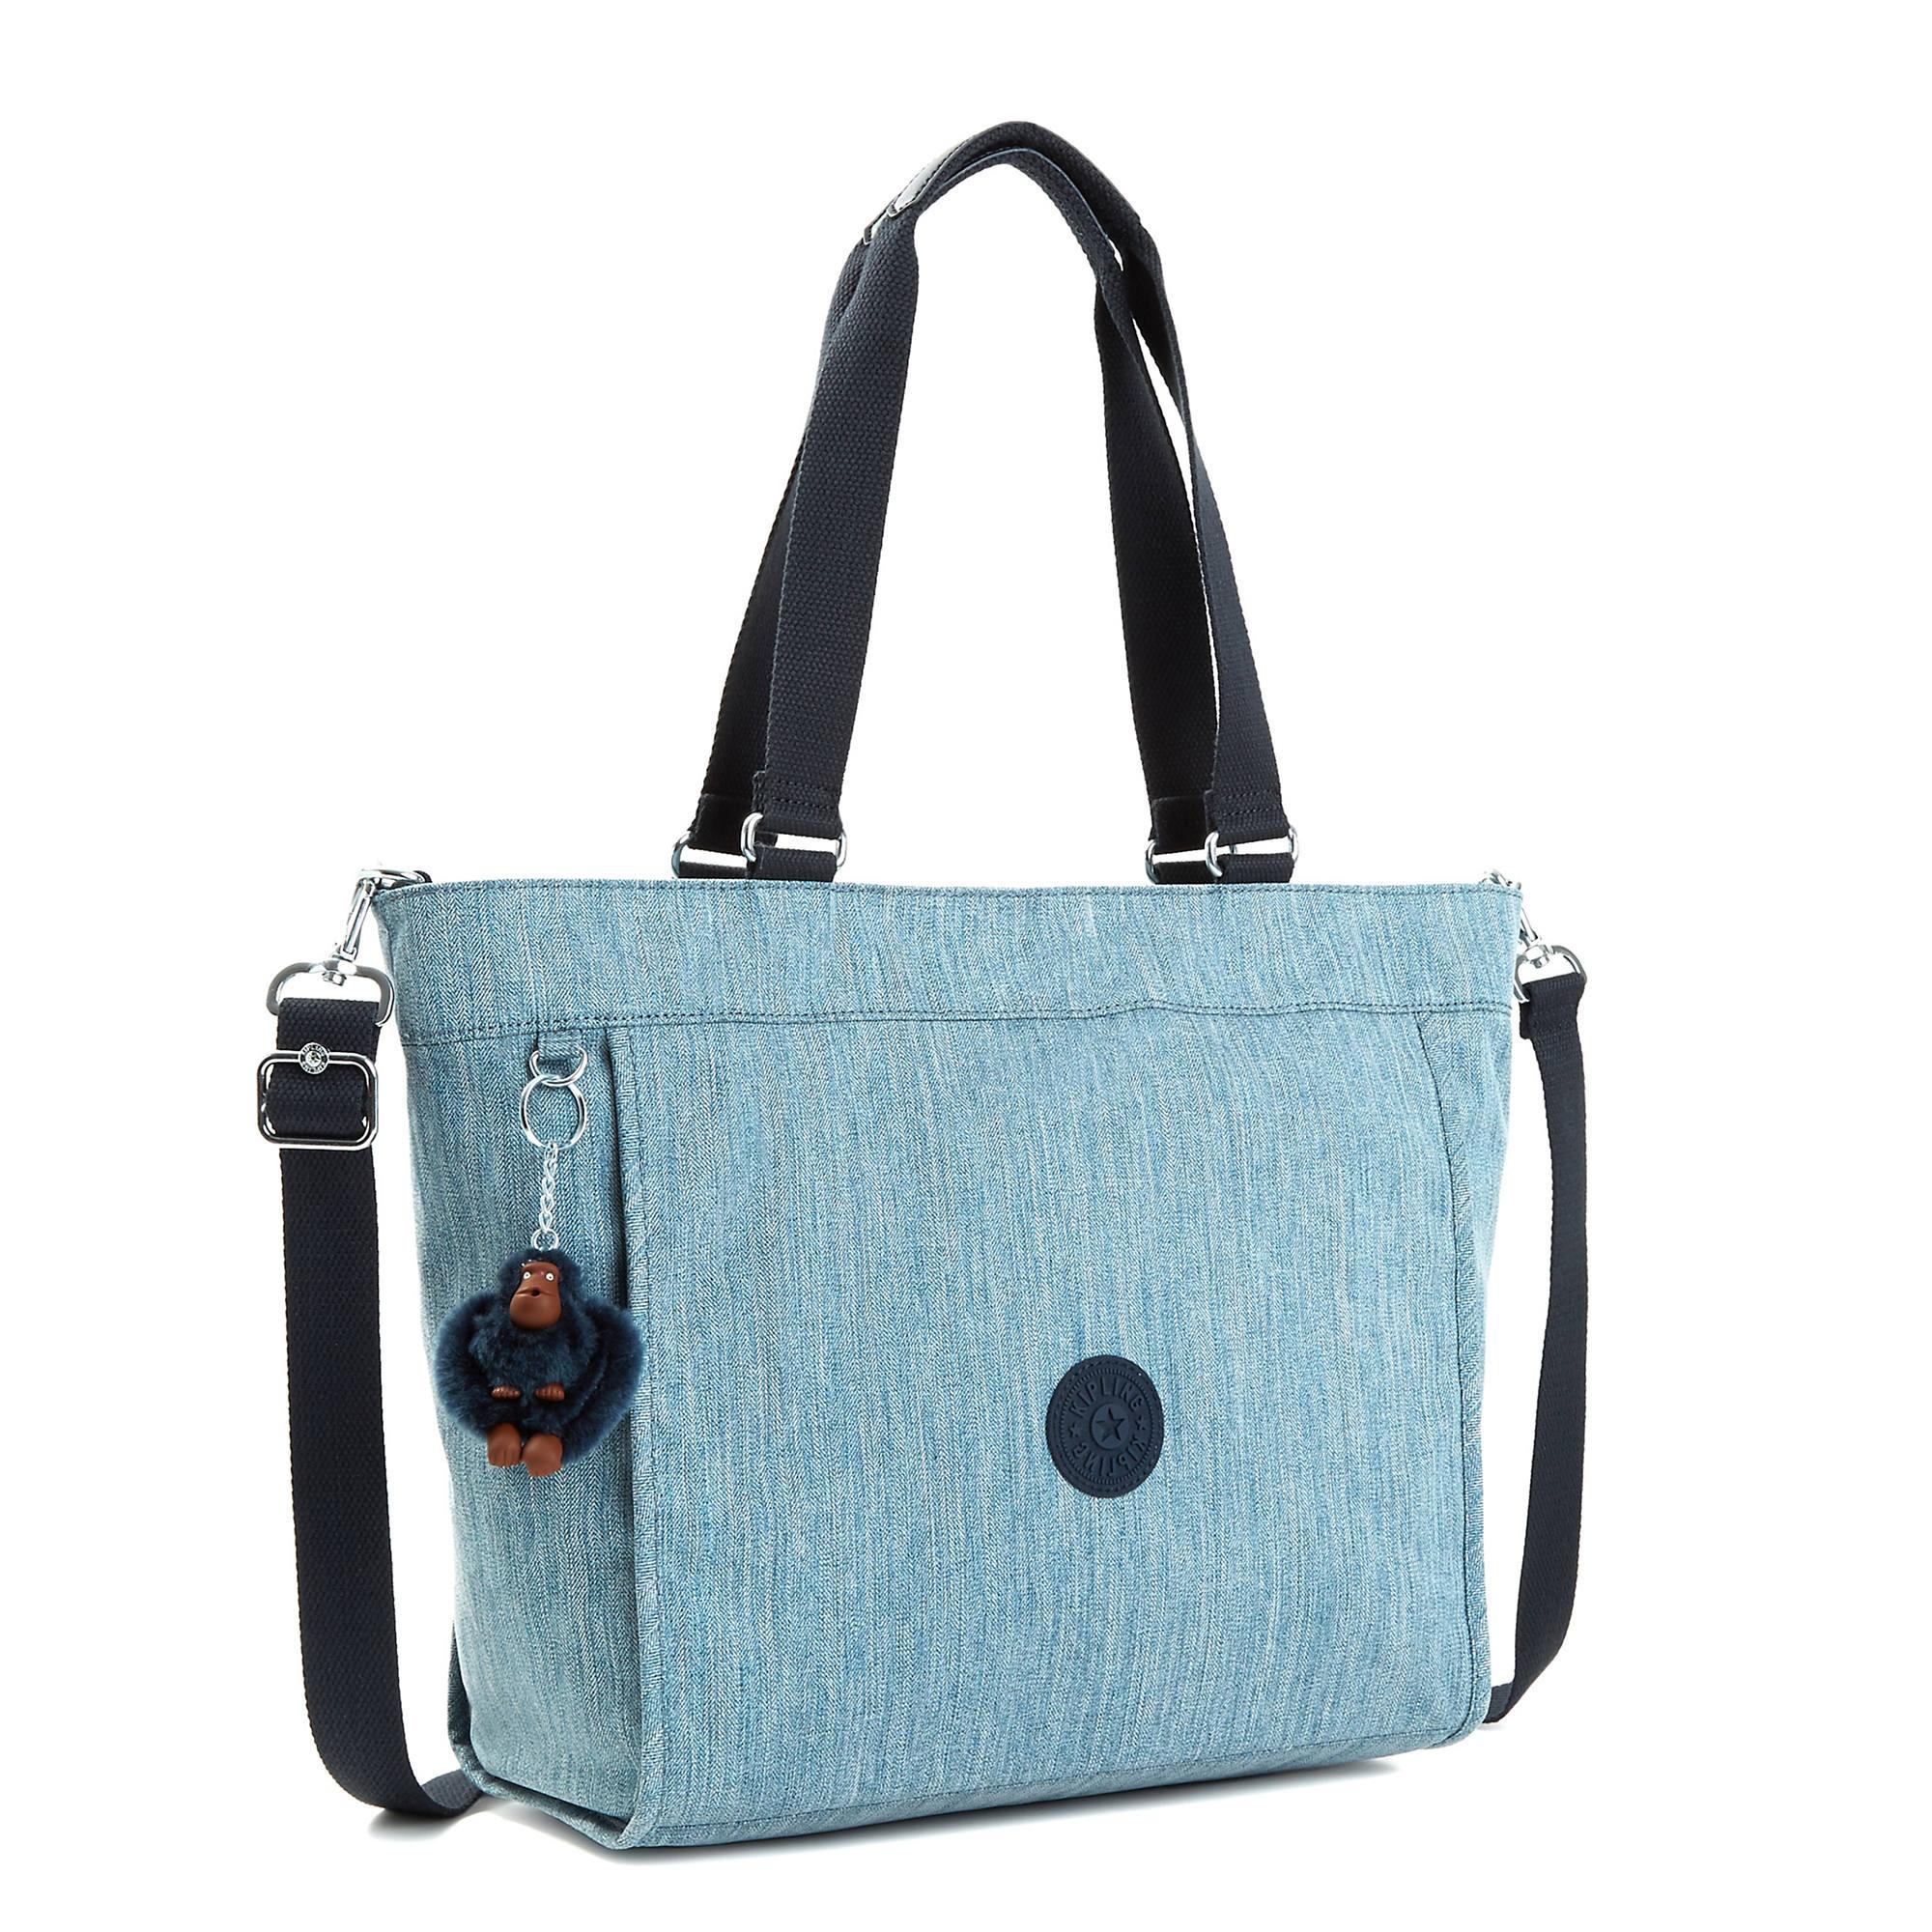 a67f77091ae1a New Shopper Medium Tote Bag